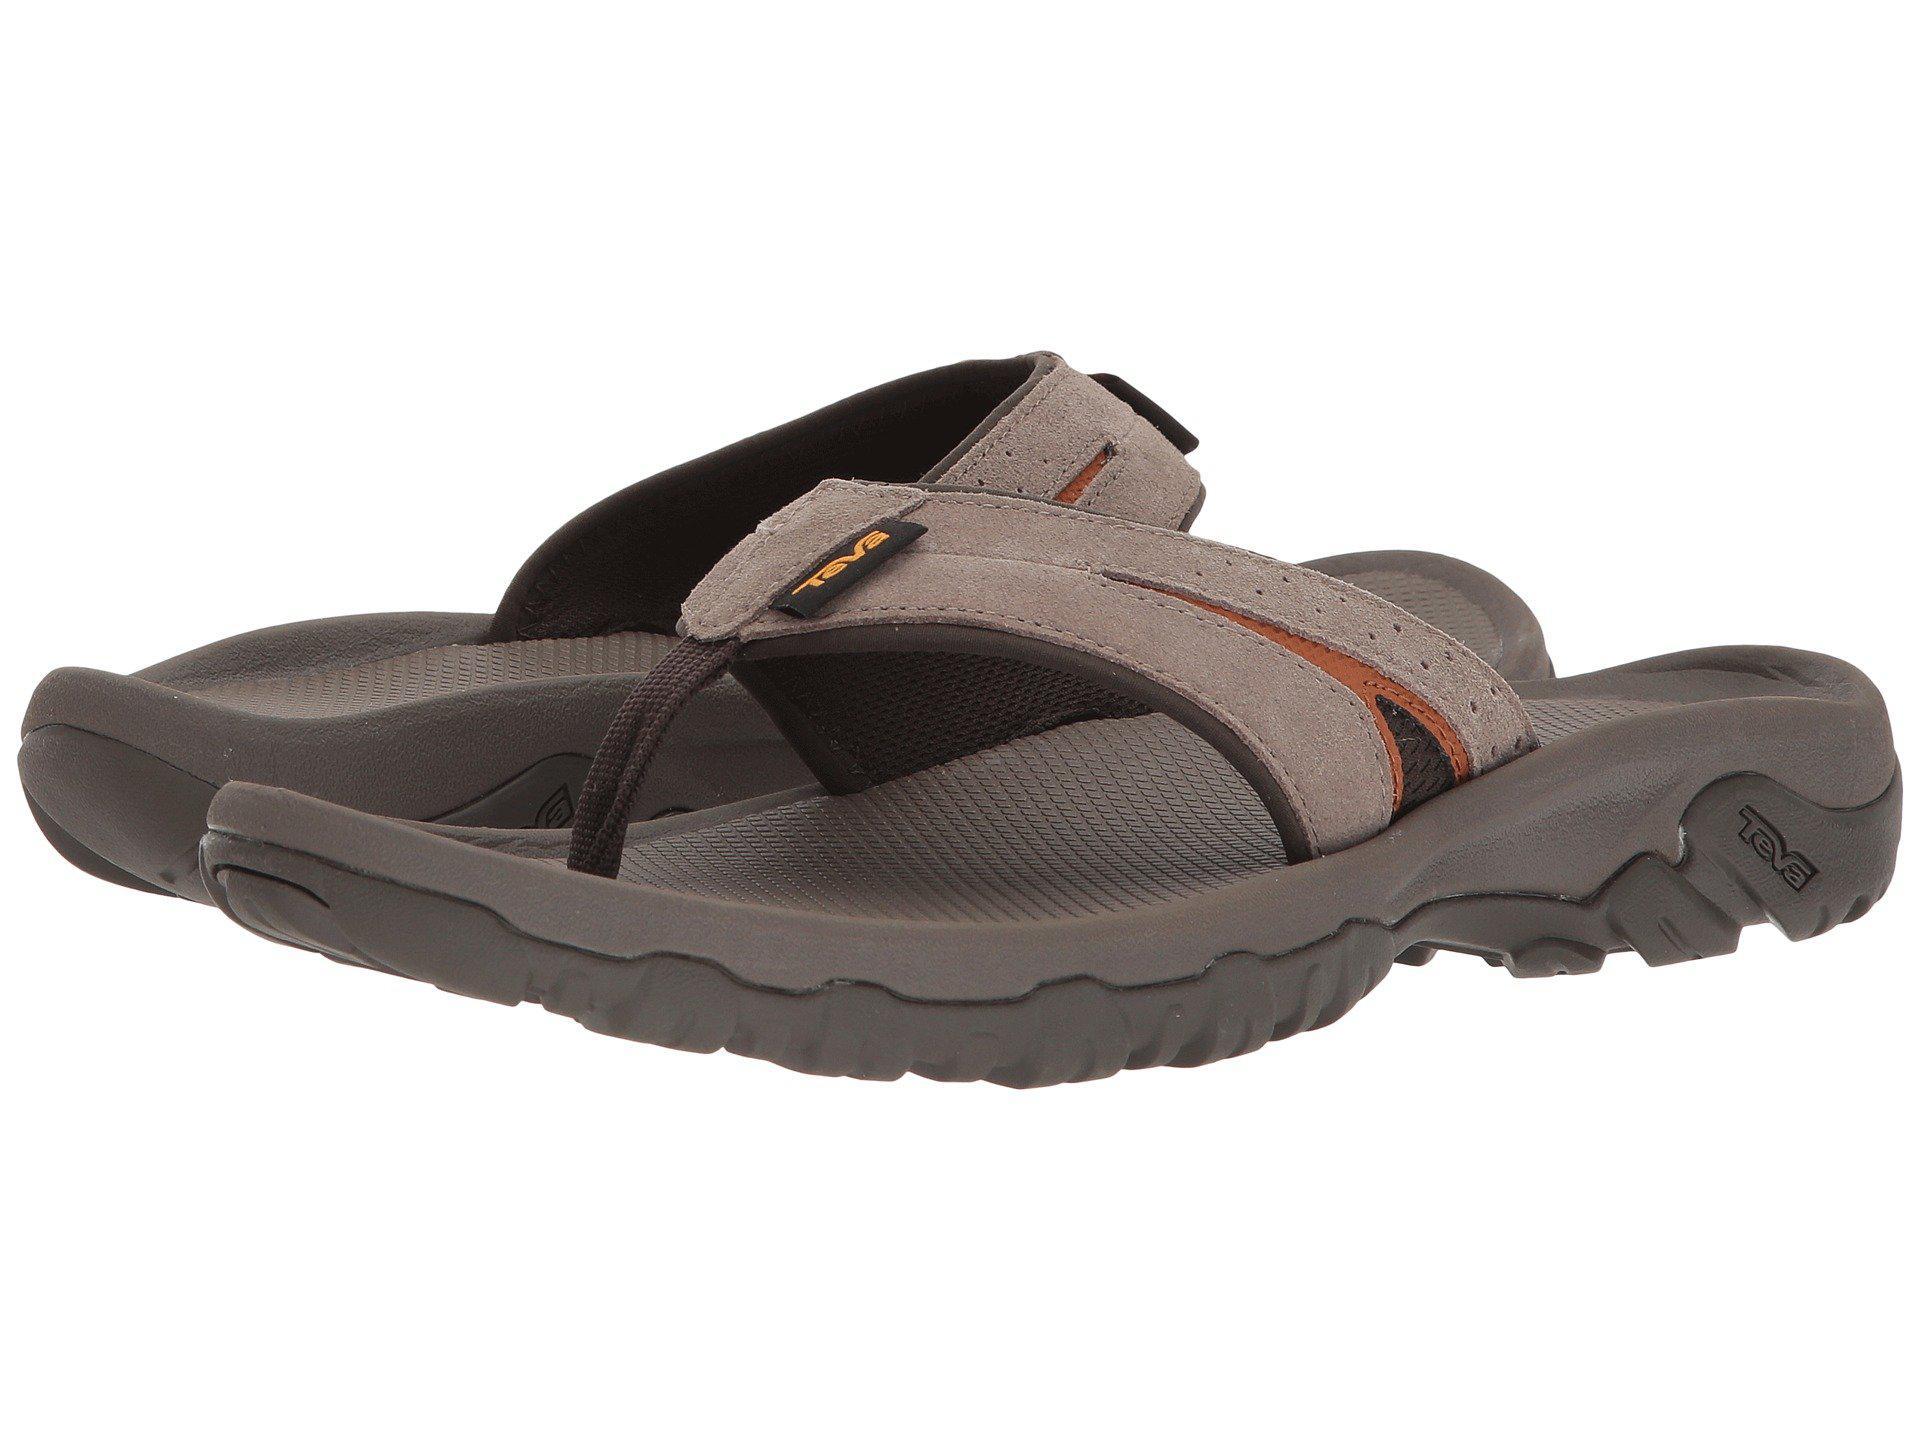 8e2d8b2f6 Lyst - Teva Katavi 2 Thong (walnut) Men s Sandals for Men